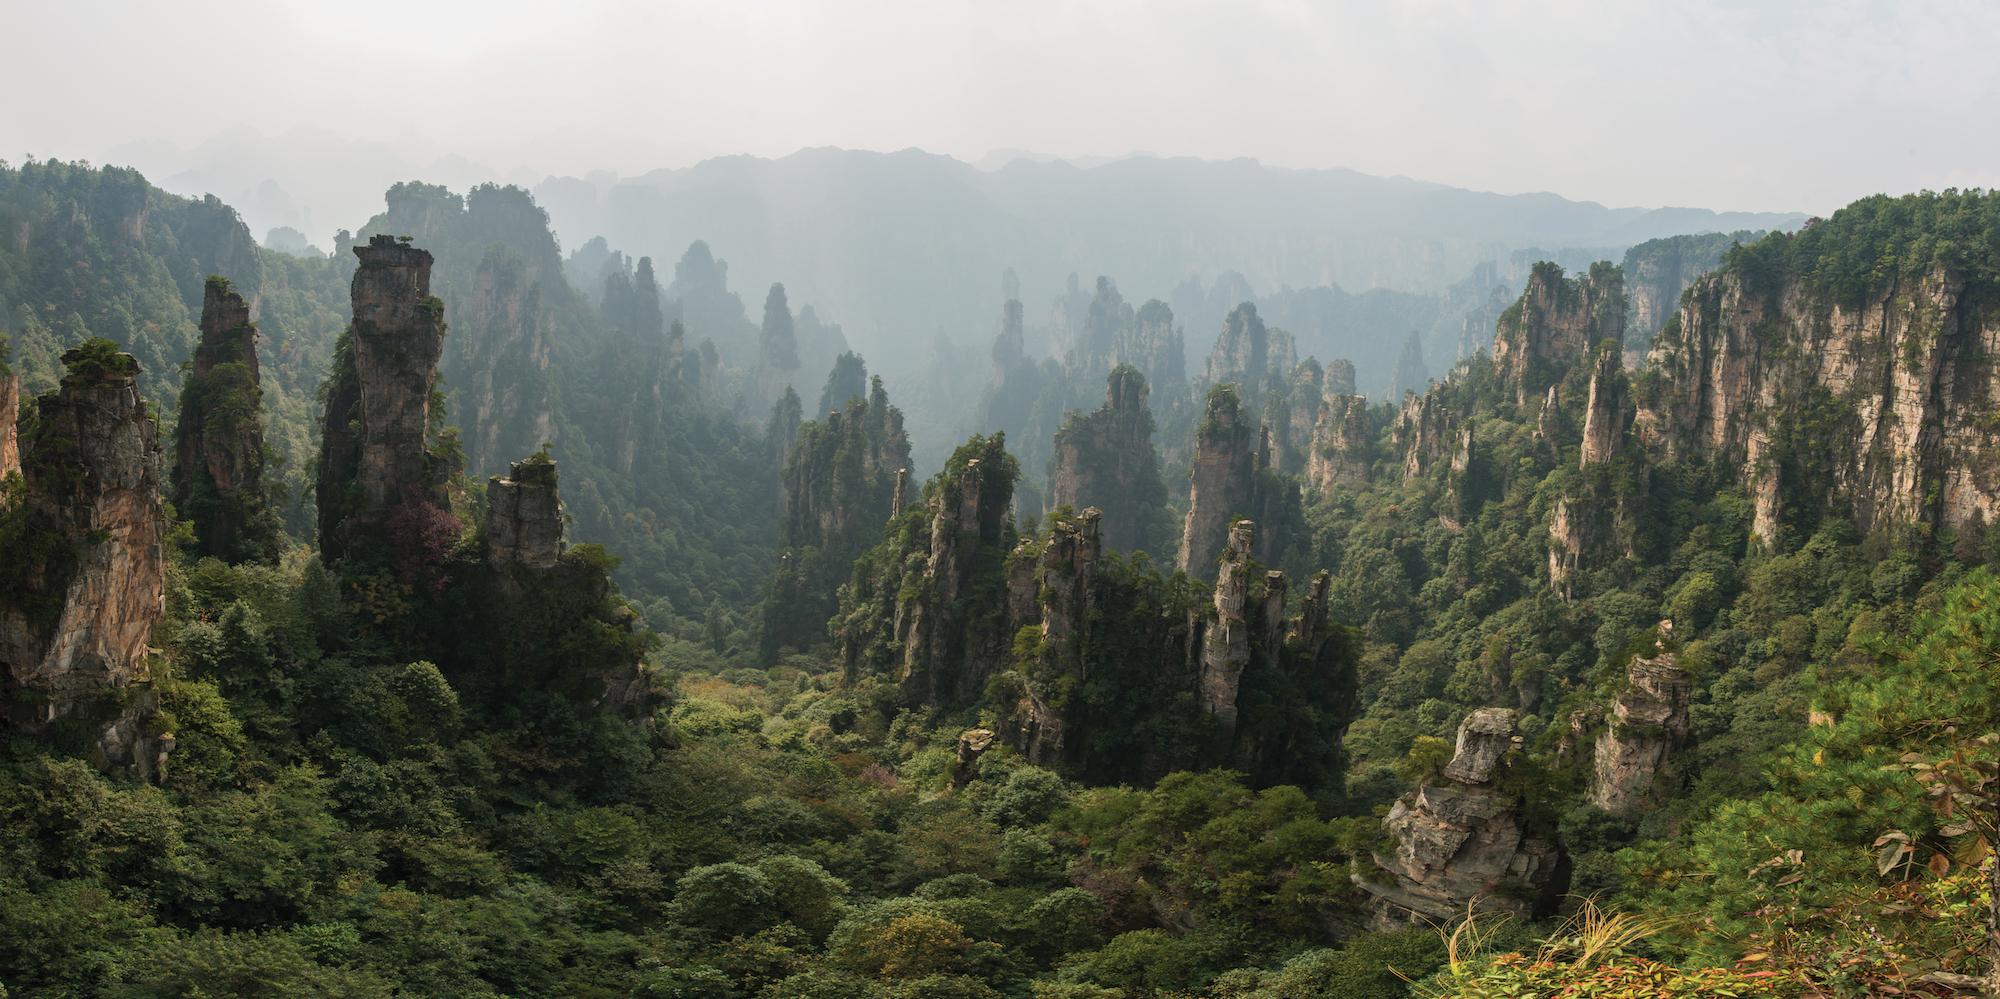 Parc national de la forêt Zhangjiajie, Chine